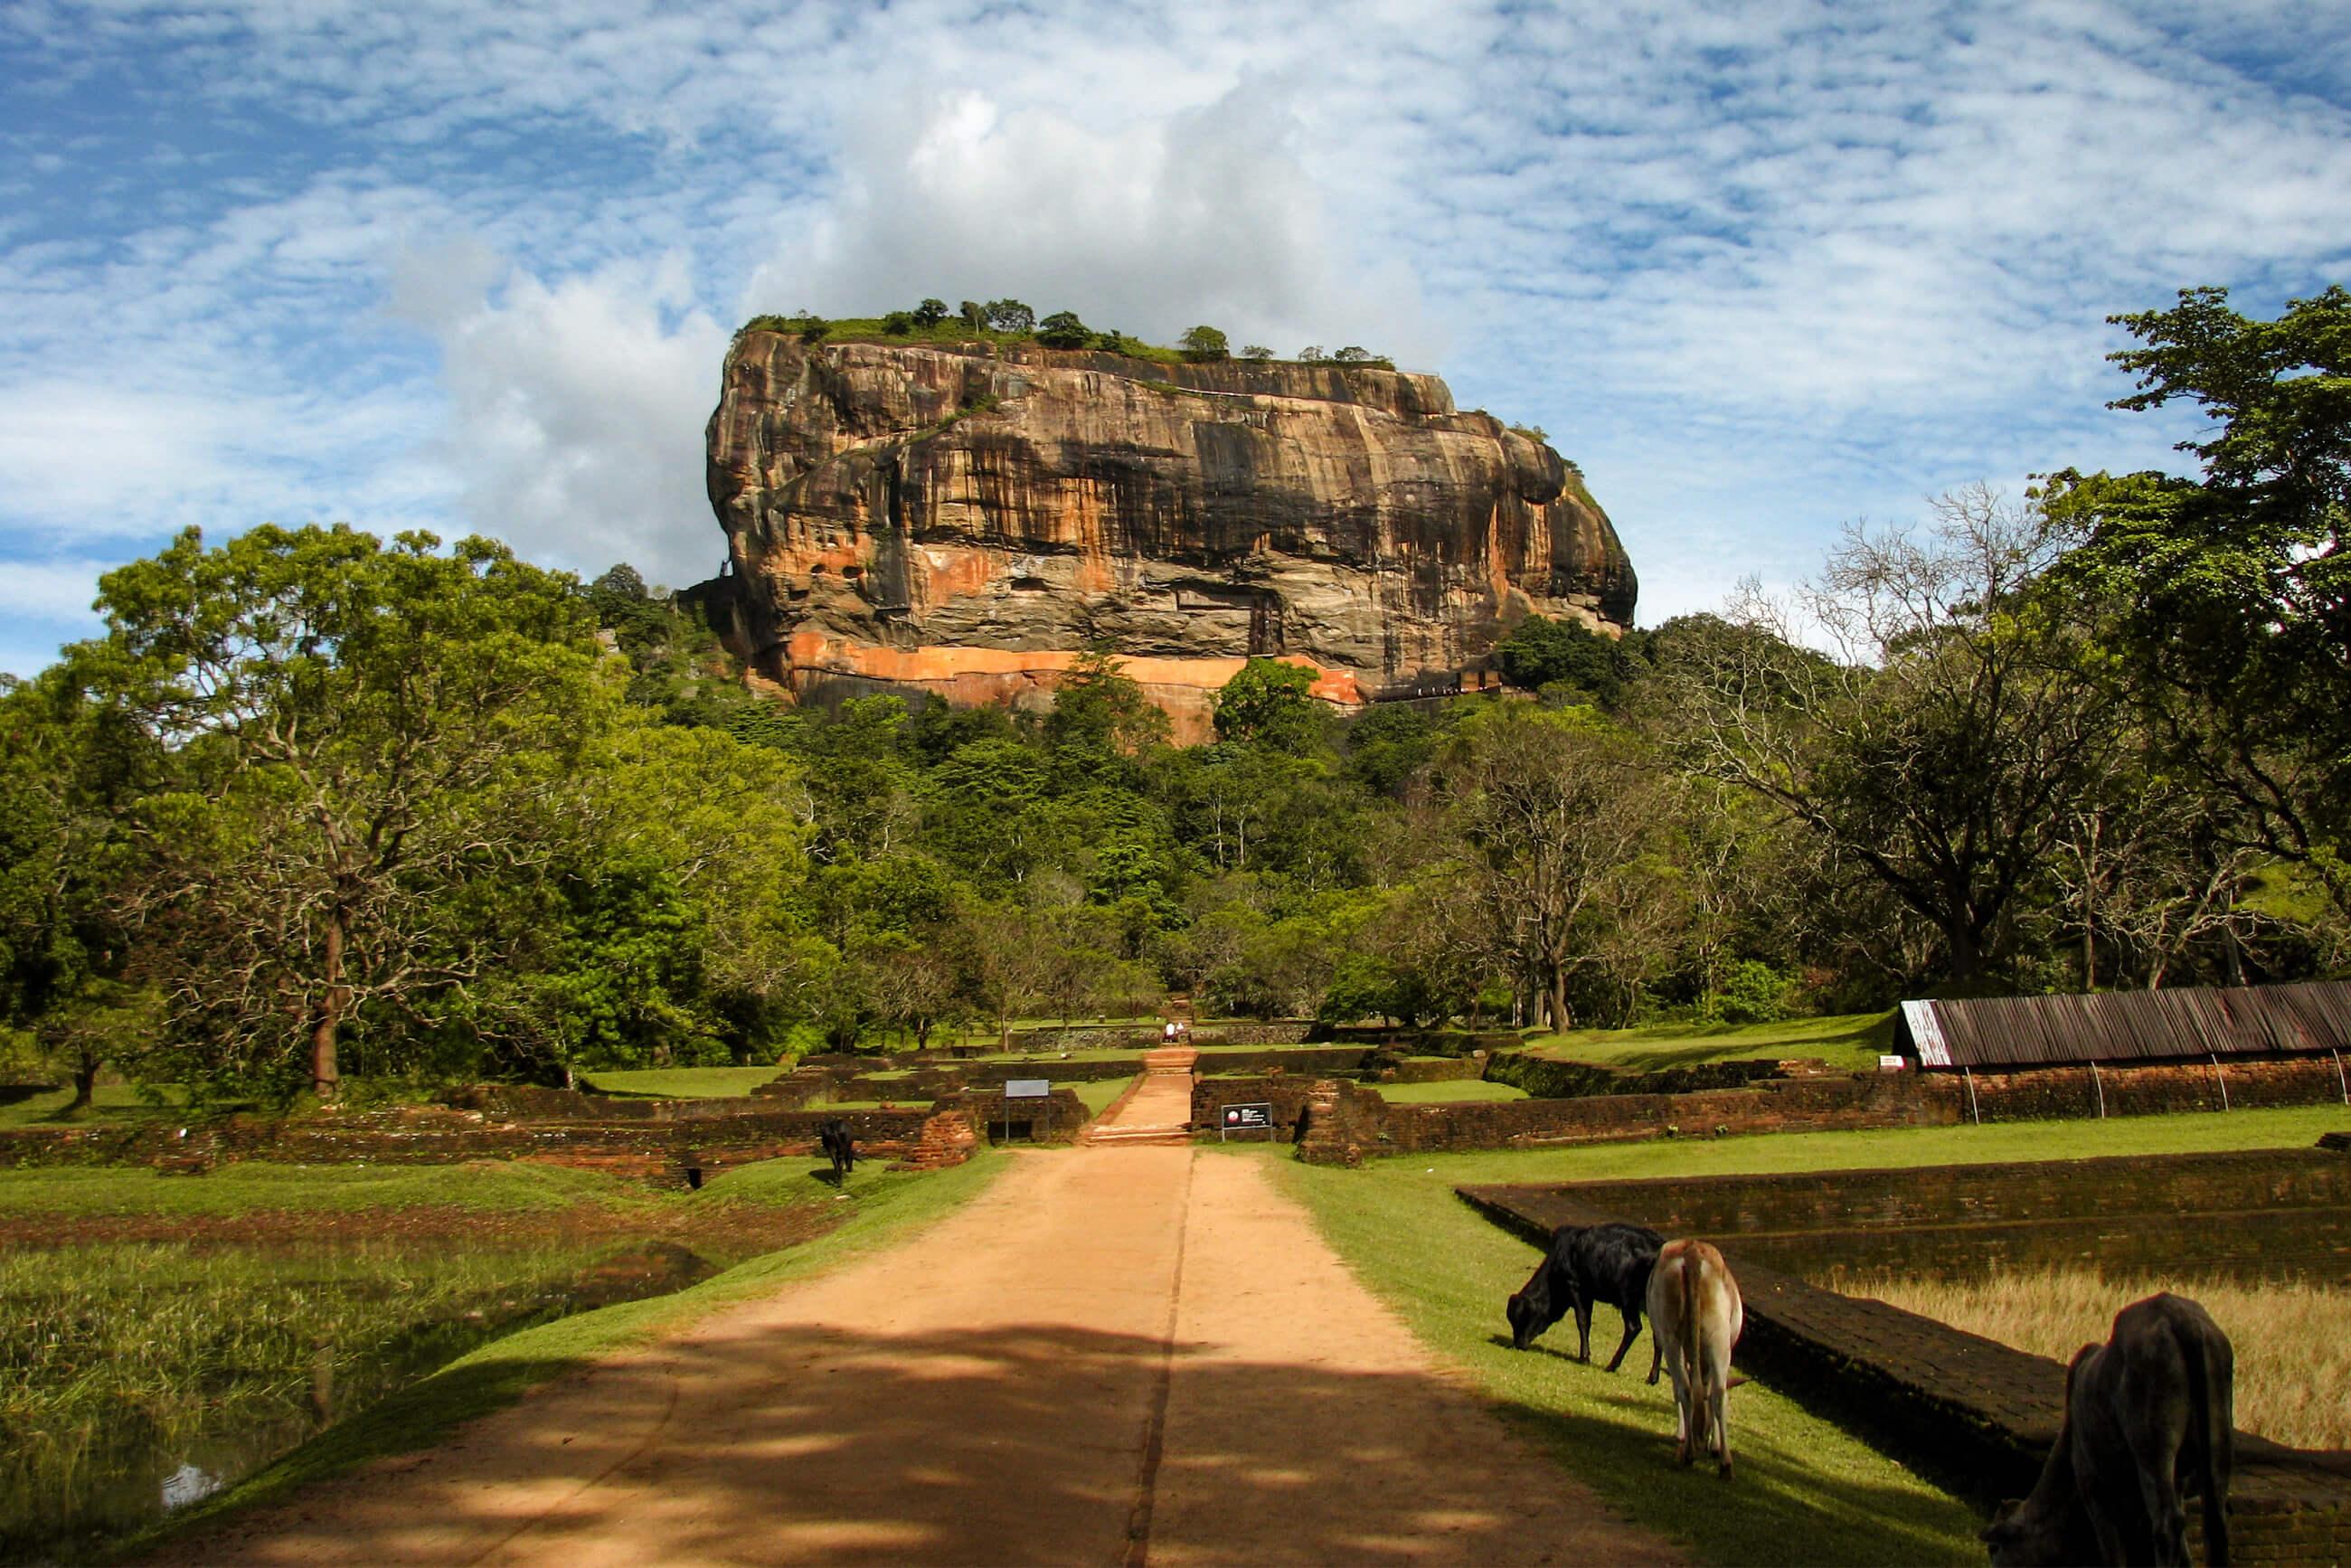 https://bubo.sk/uploads/galleries/5058/archiv_srilanka_sigiriyarock.jpg